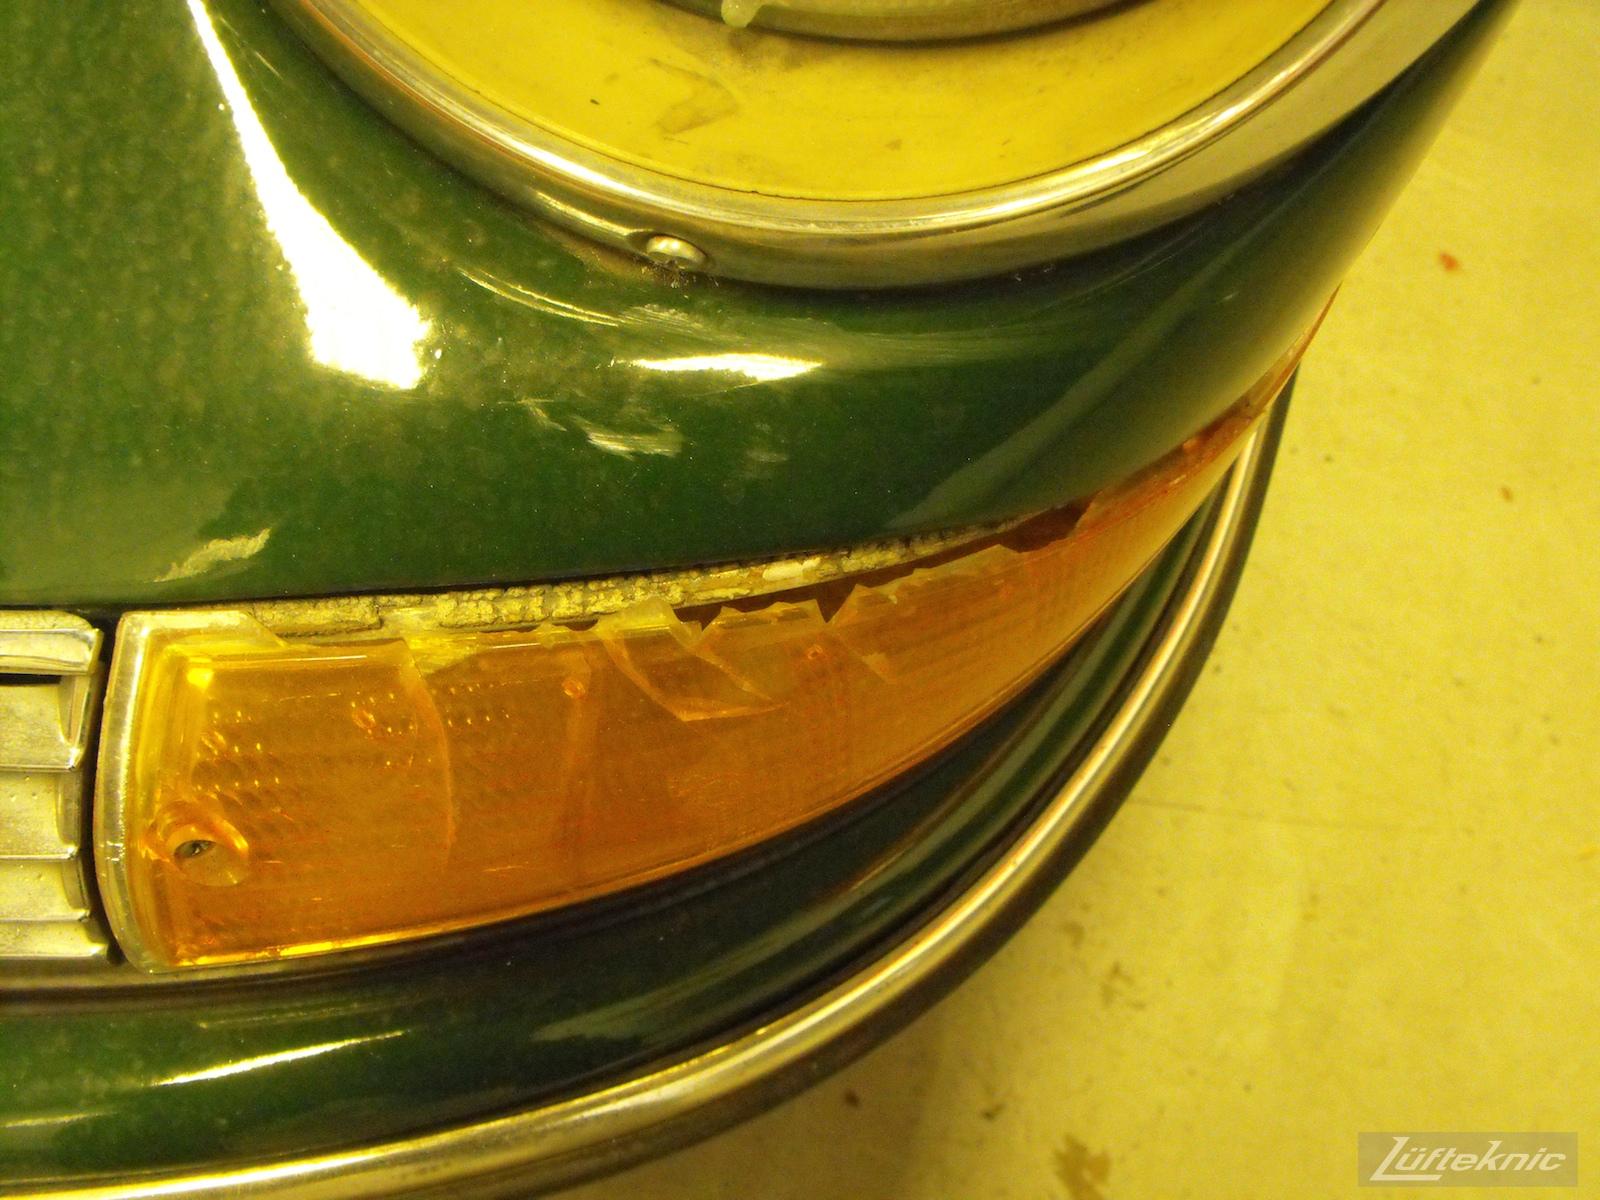 A cracked front turn signal lens of an Irish Green Porsche 912 undergoing restoration at Lufteknic.